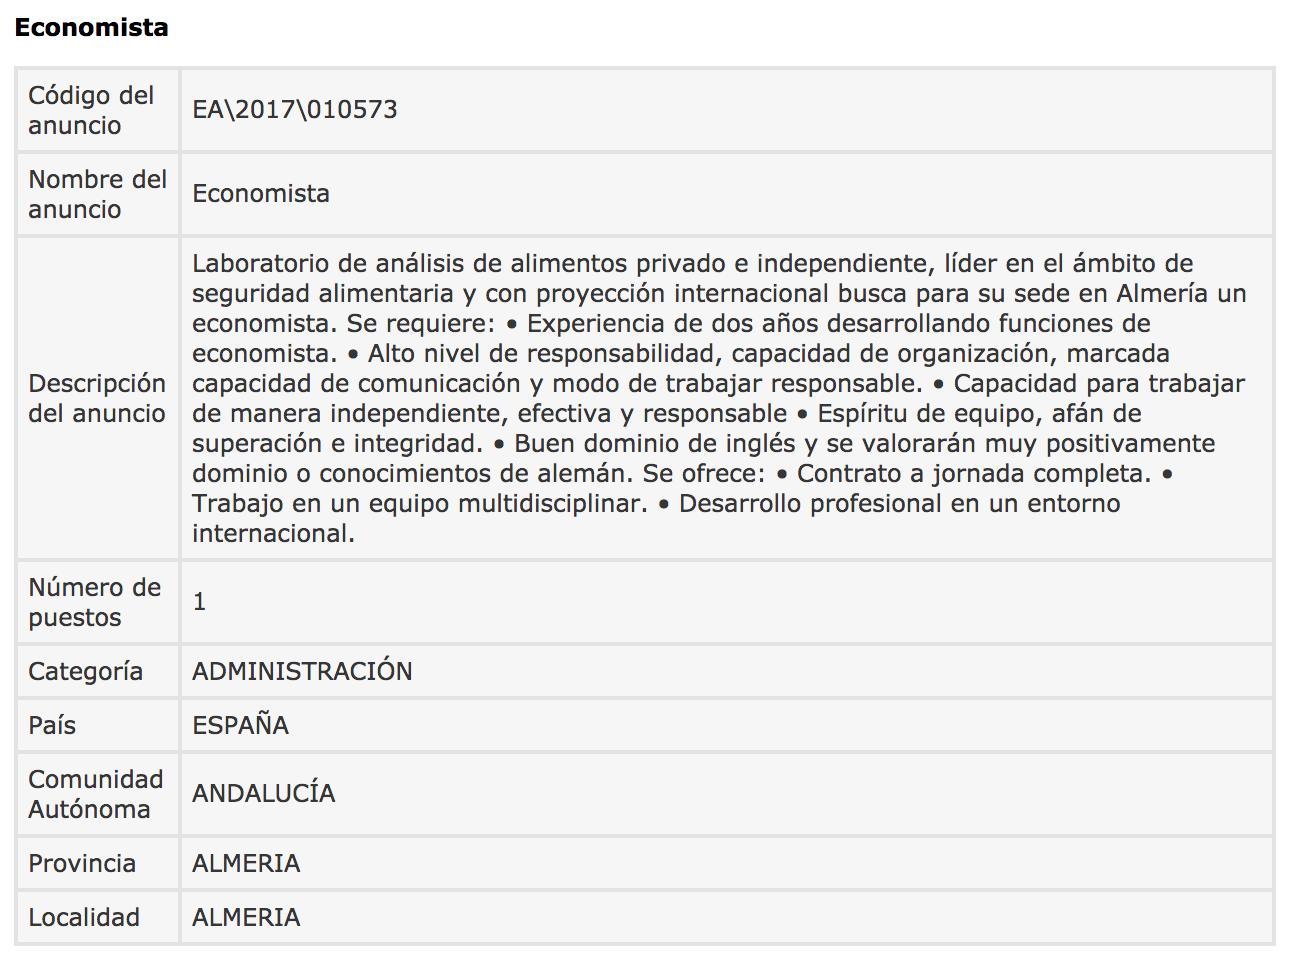 Ofertas de Empleo en España: Economista - Almería - photo#23